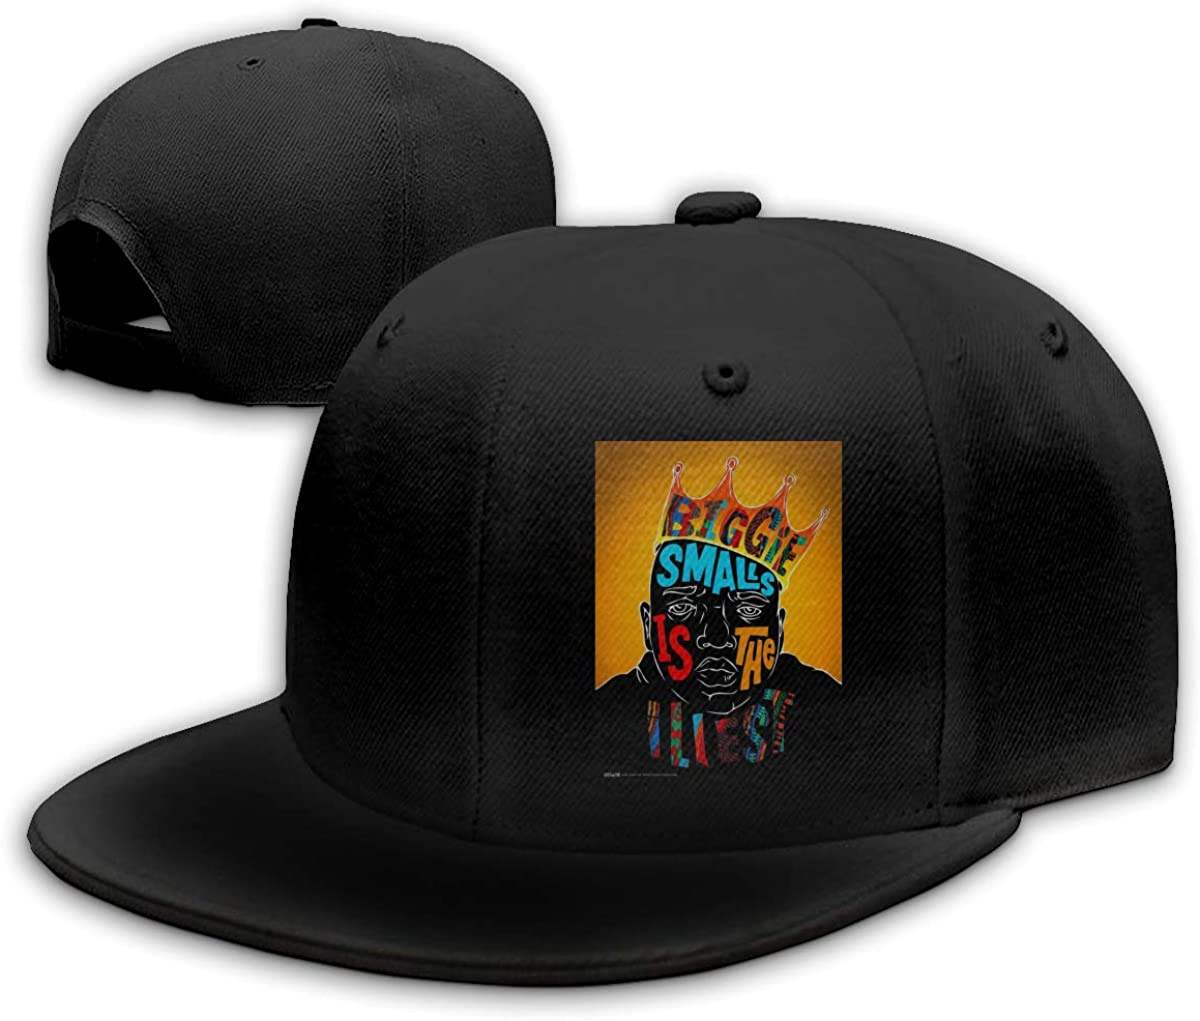 Kemeicle Unisex Biggie Smalls is The Illest Baseball Cap Flat Bill Street Rapper Hat Adjustable Snapback